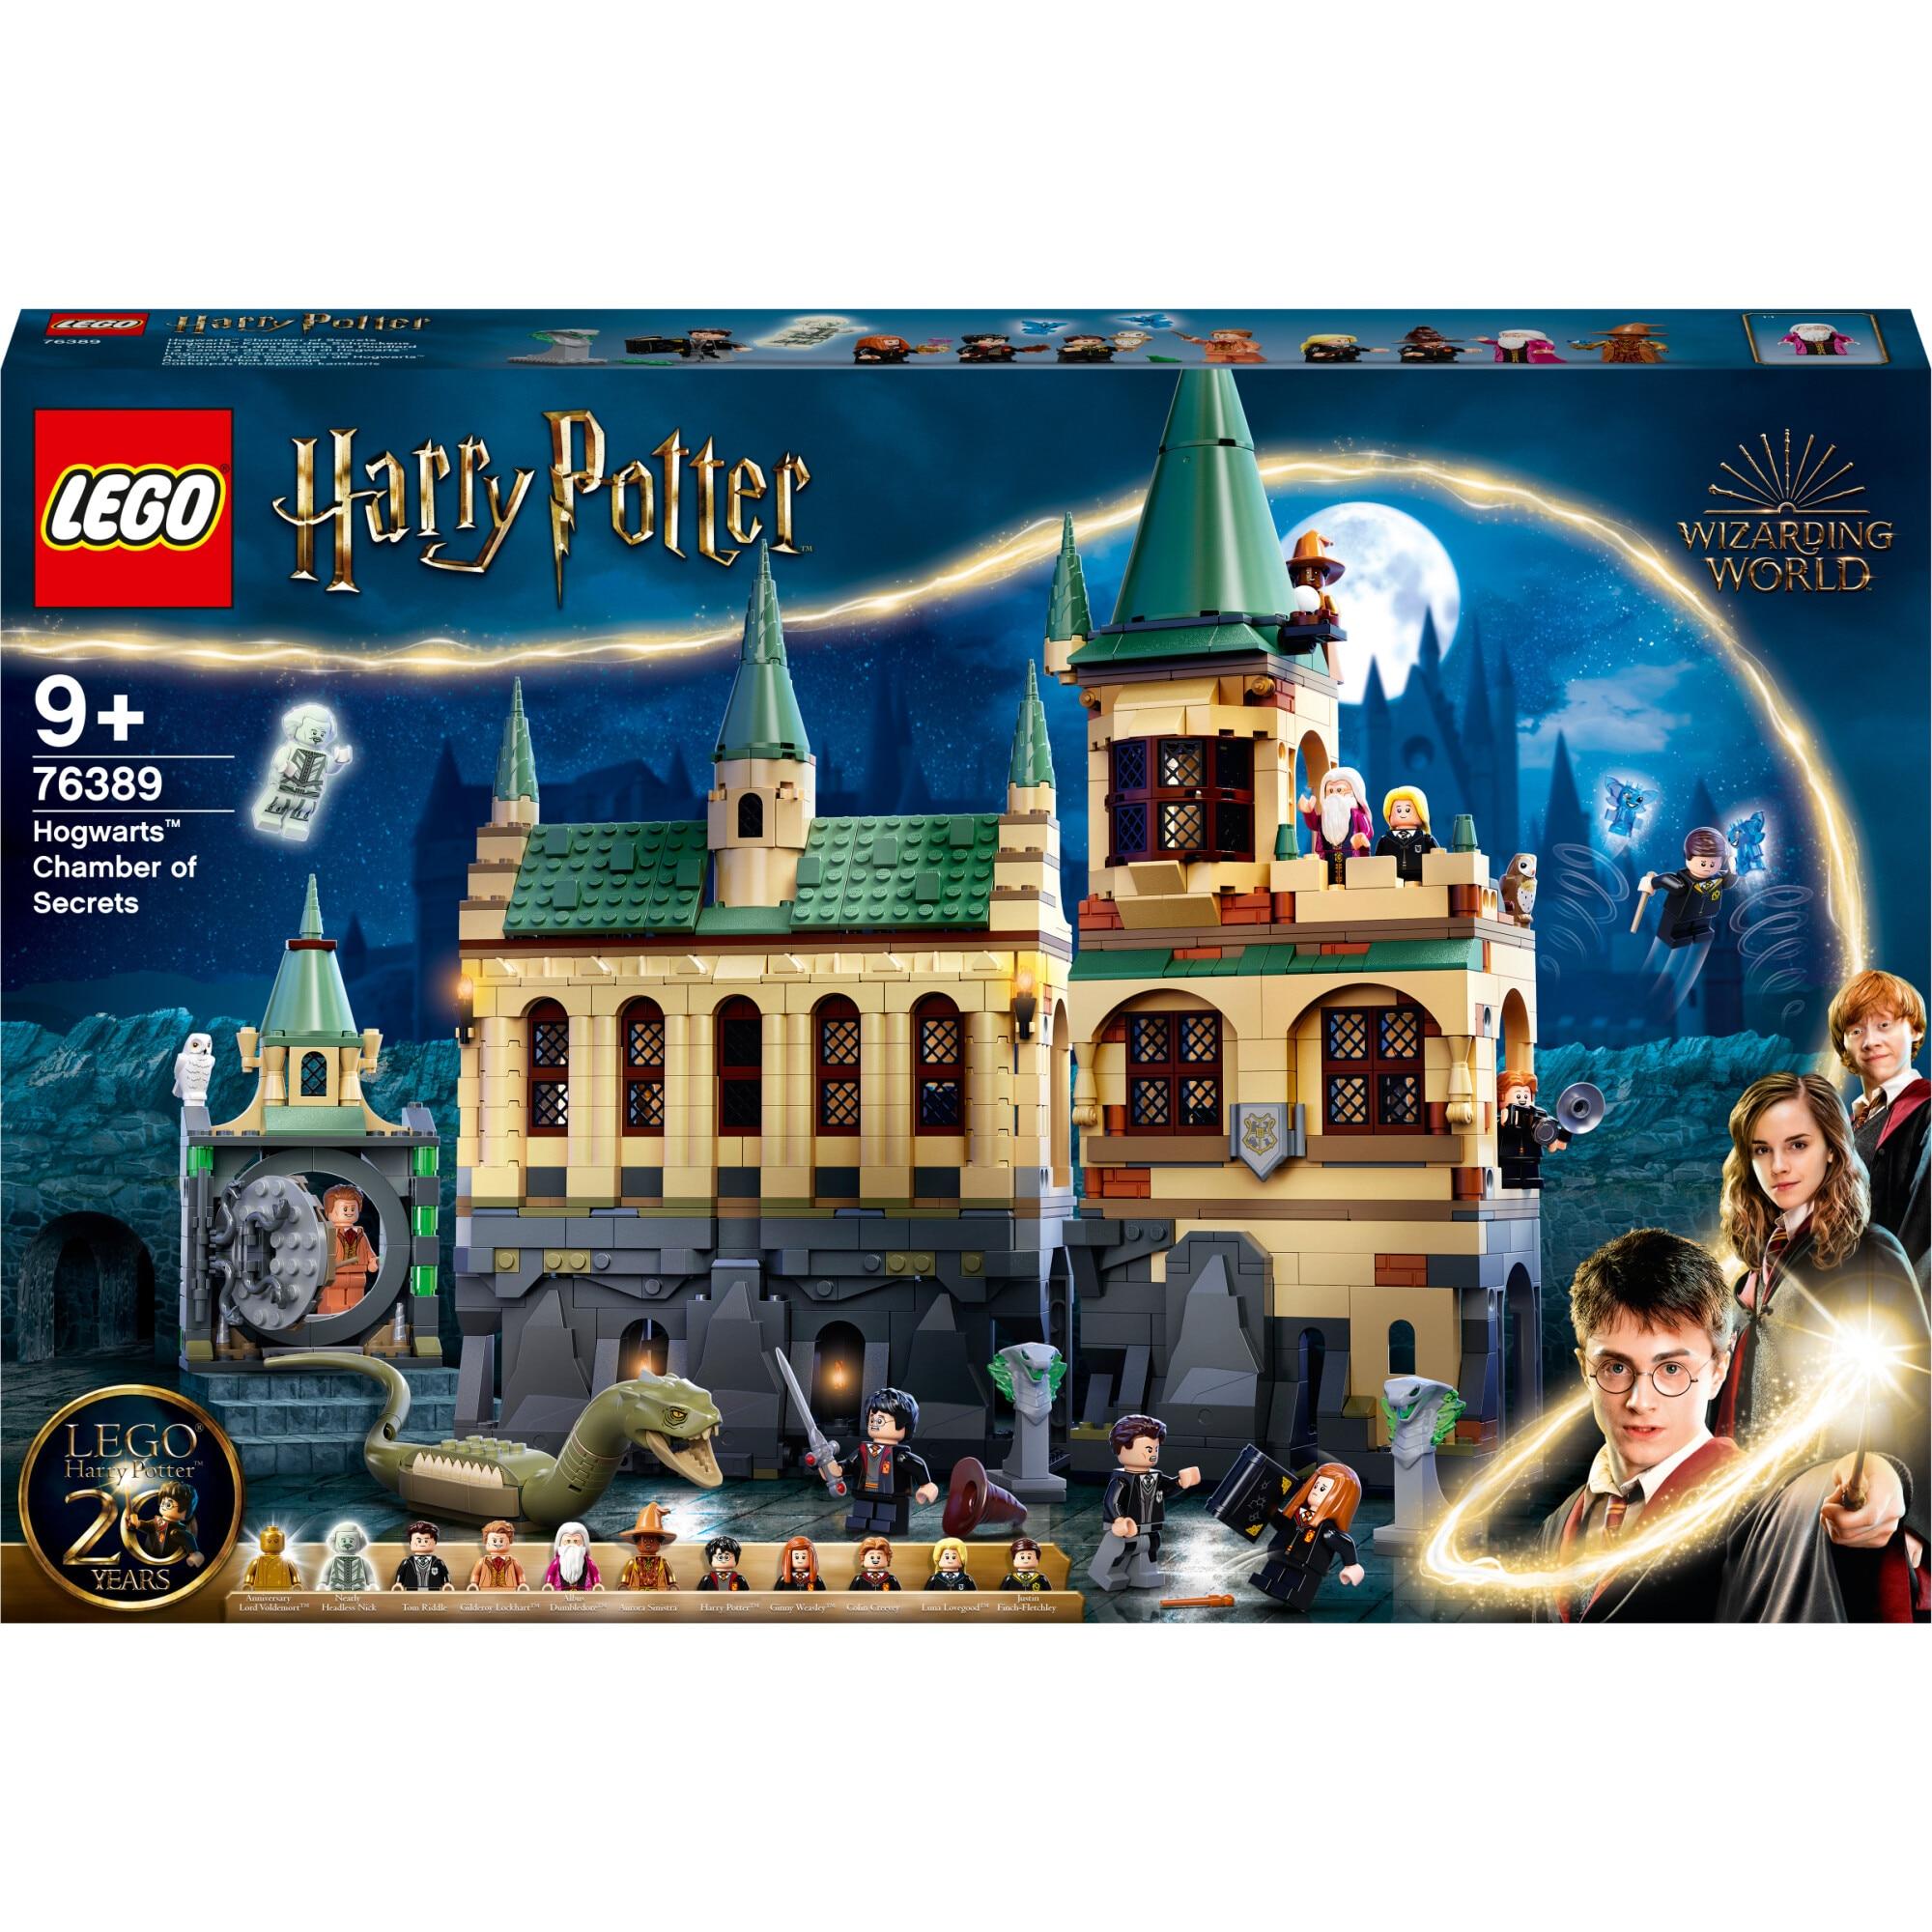 Fotografie LEGO Harry Potter - Camera secretelor Hogwarts 76389, 1176 piese